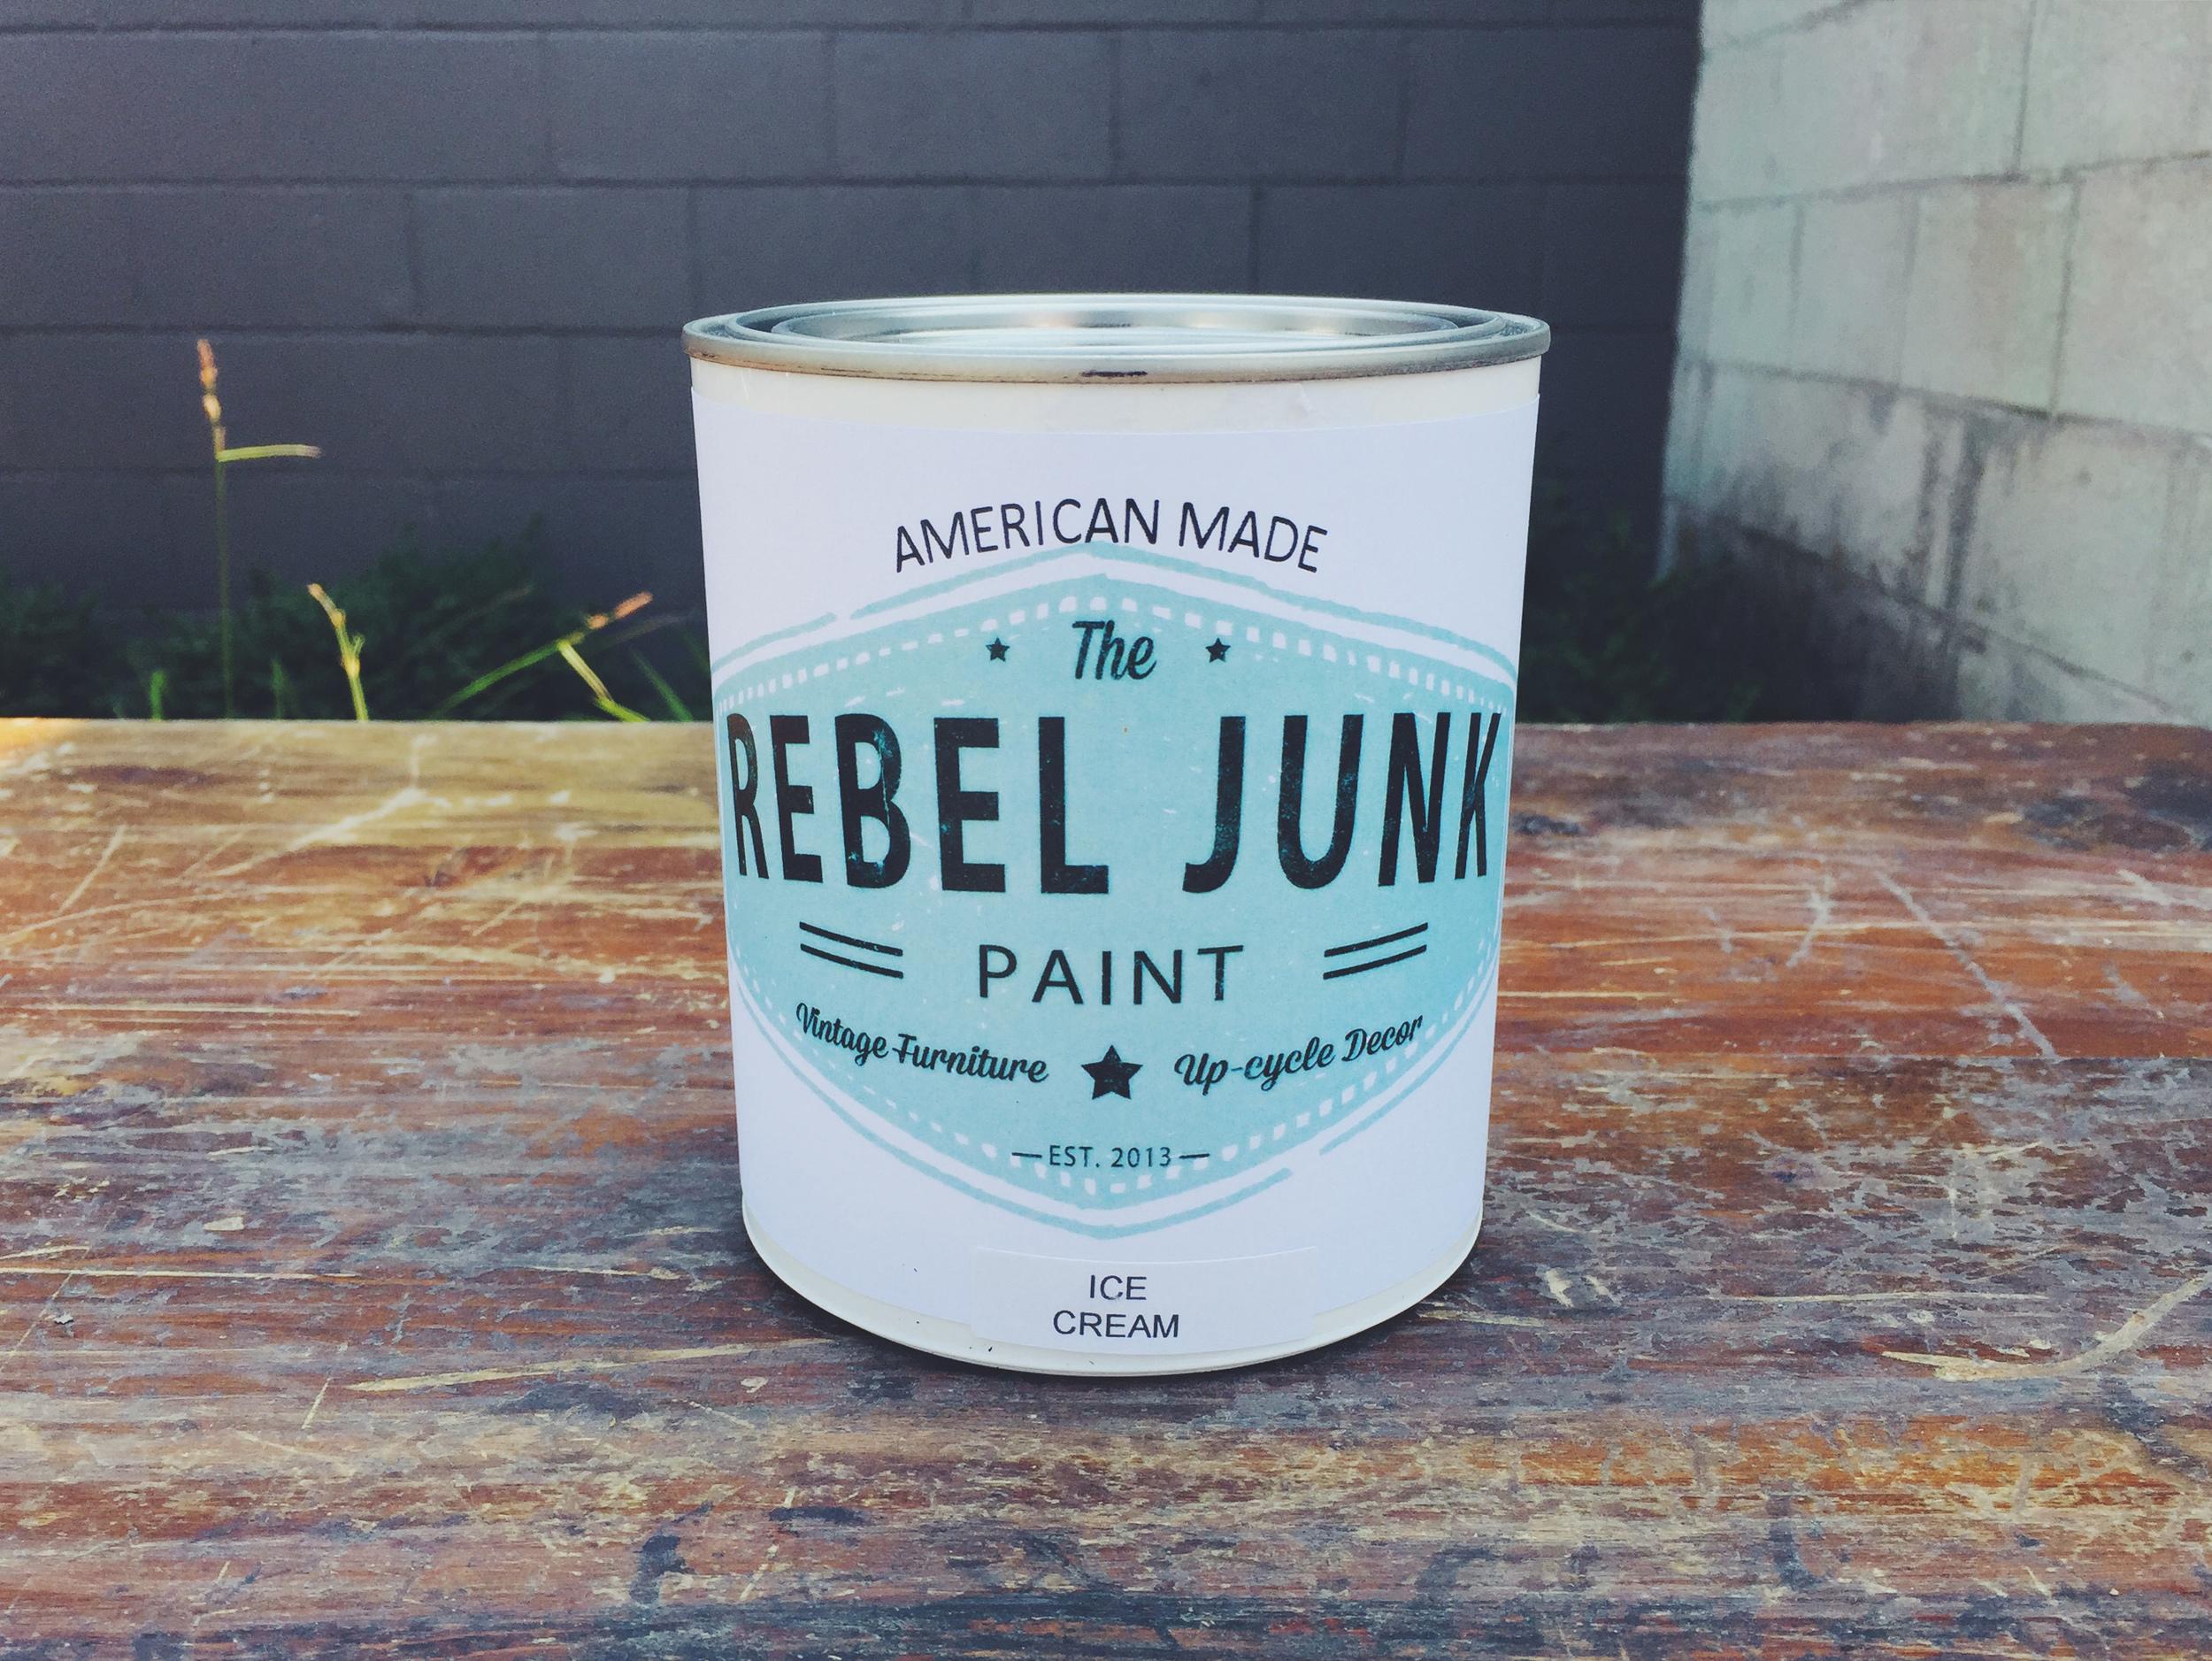 rebel junk paint